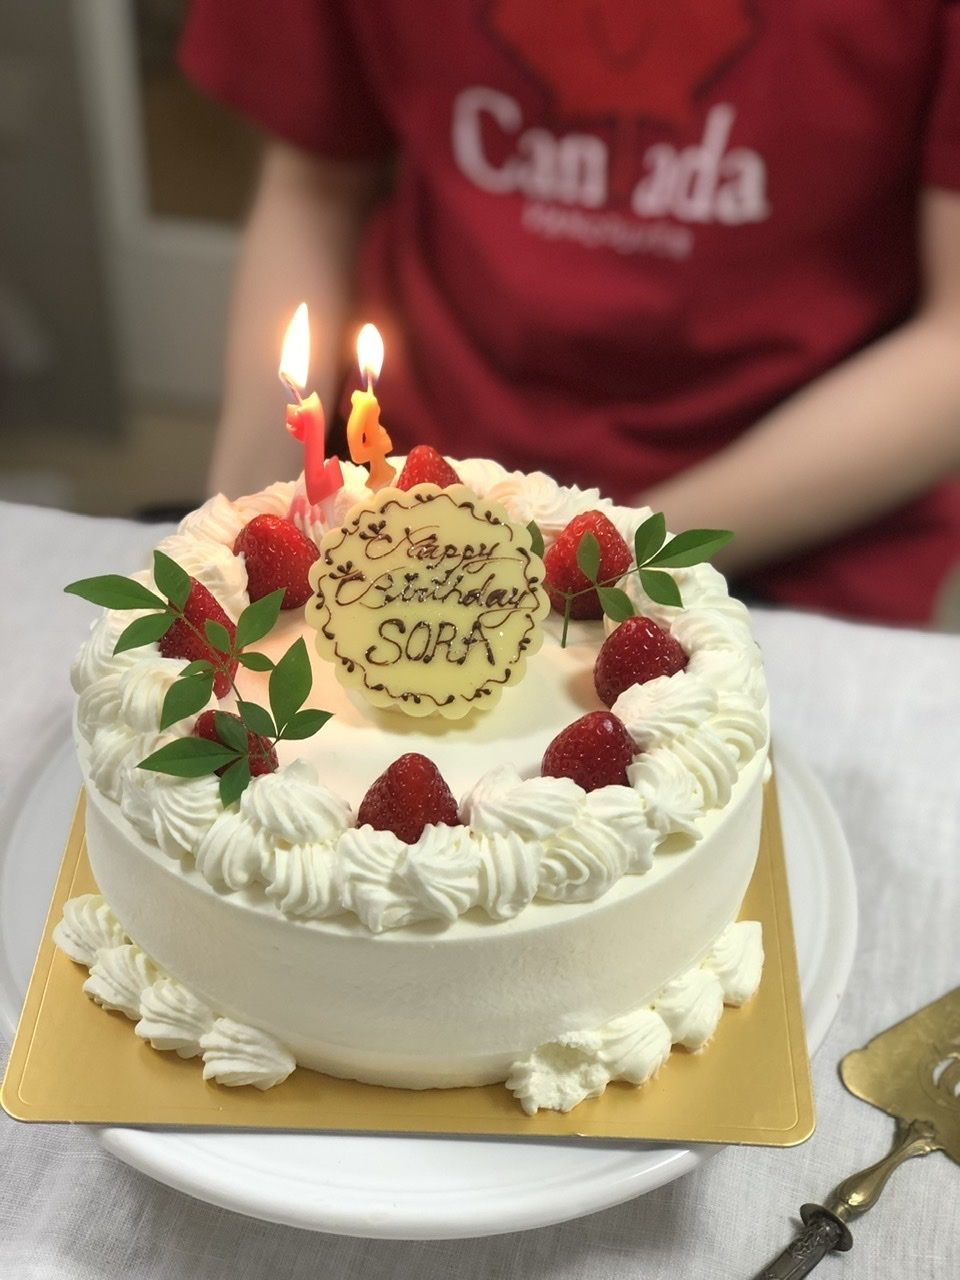 Happy Birthday Sora!24歳おめでとう!_a0157409_14544500.jpeg